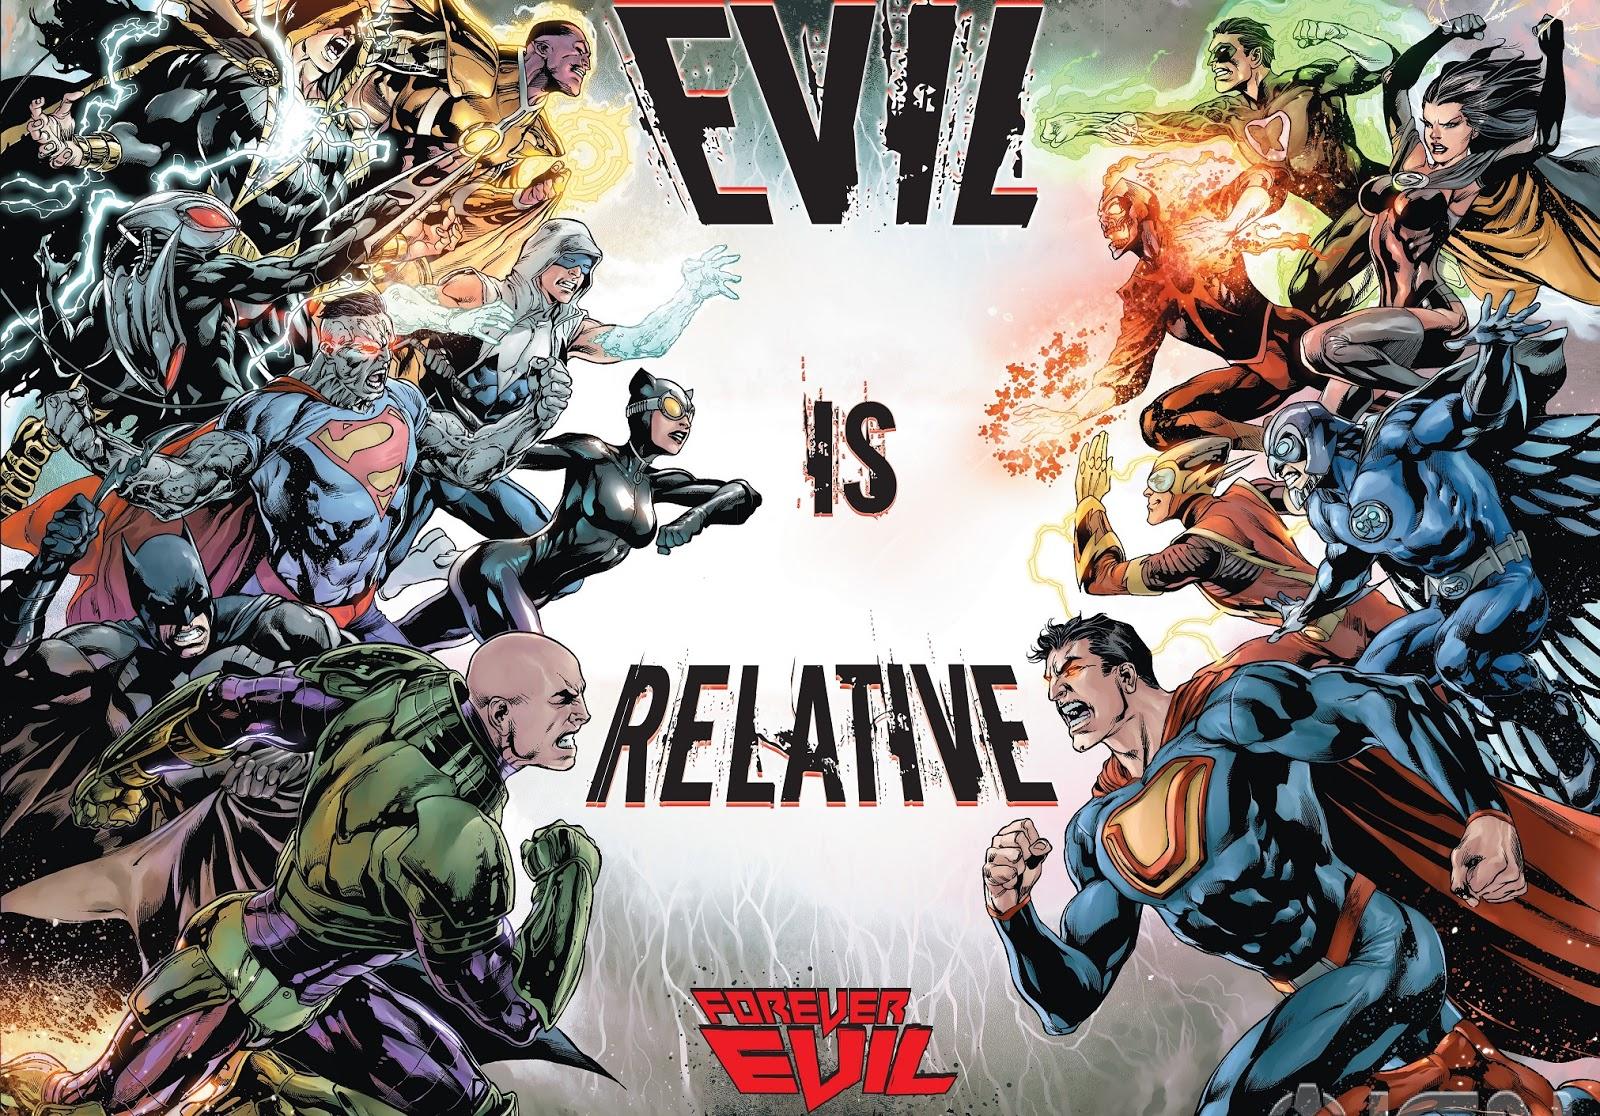 Guia de Leitura: DC Rebirth S